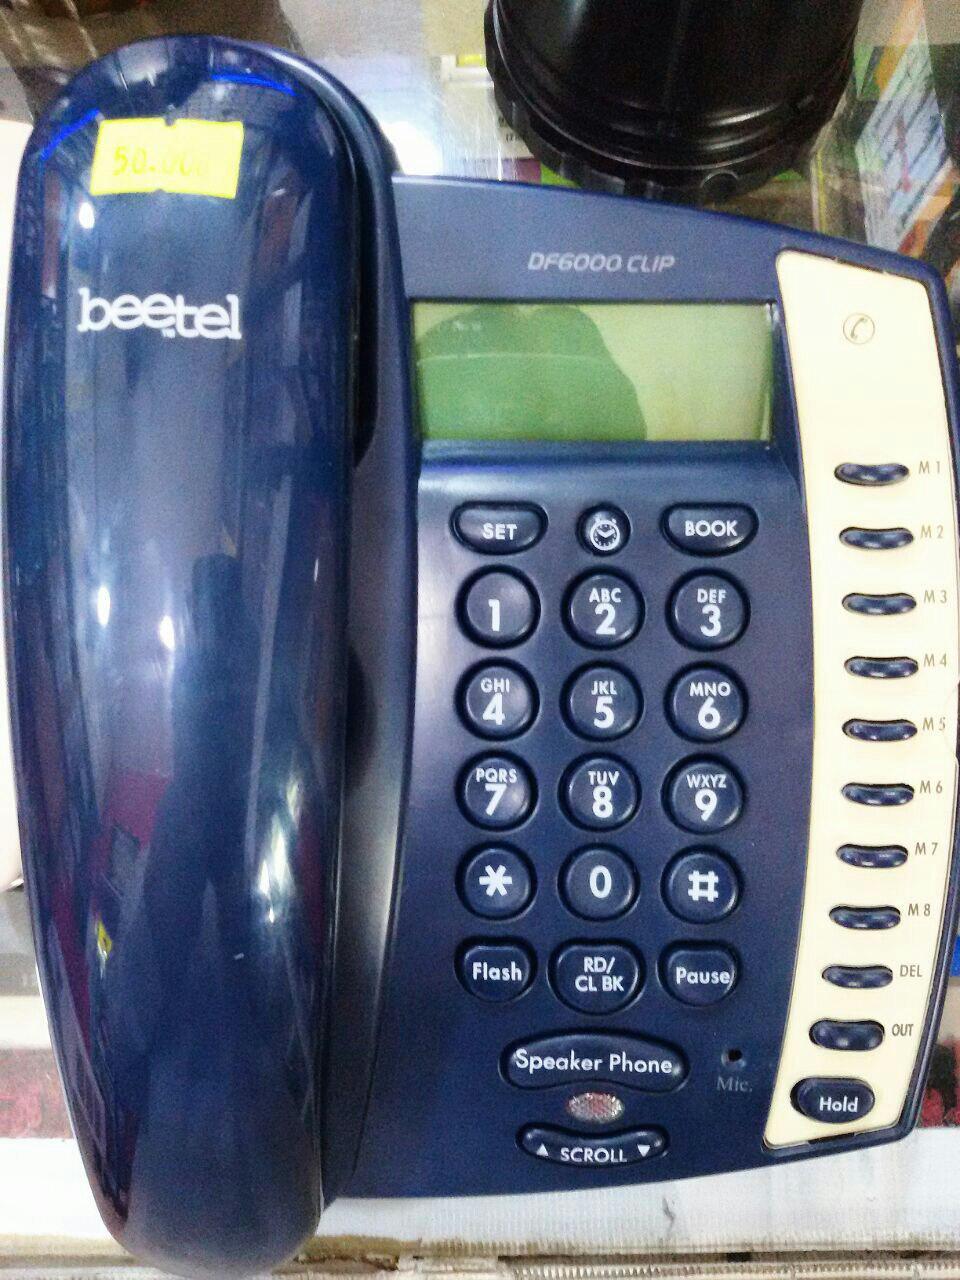 تلفن رومیزی beetel تحت لیسانس امریکا-کانادا مدل  DF6000